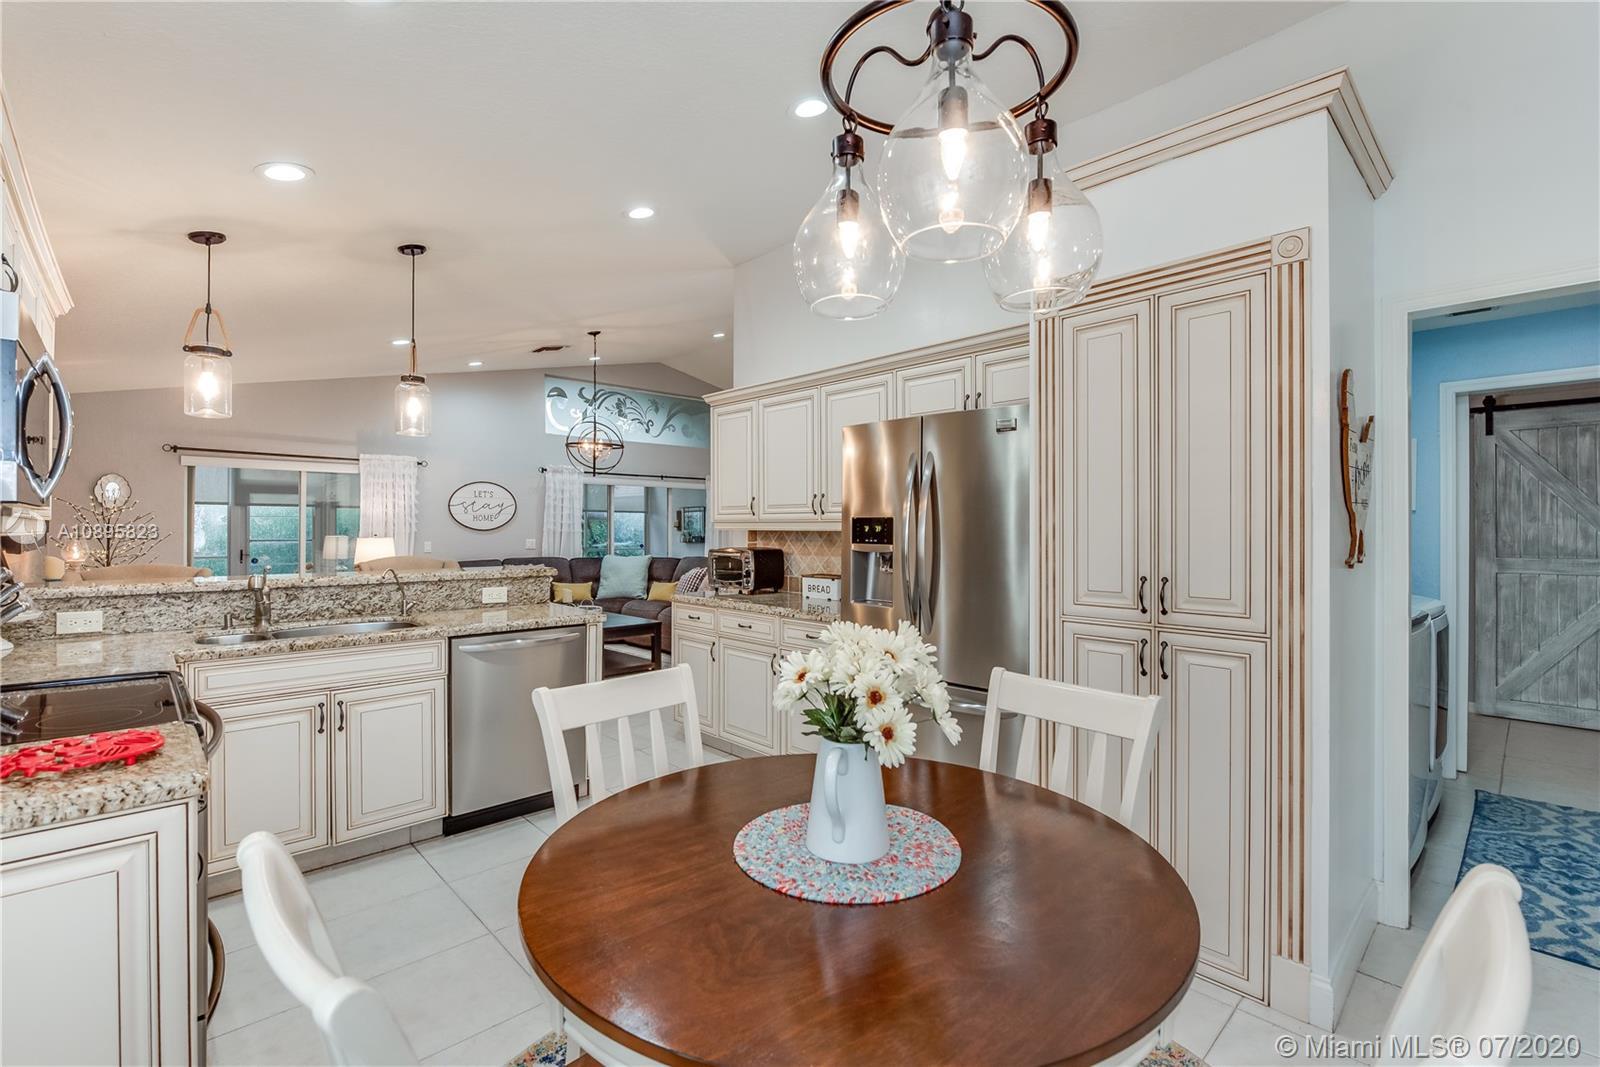 Bright, quality, working kitchen